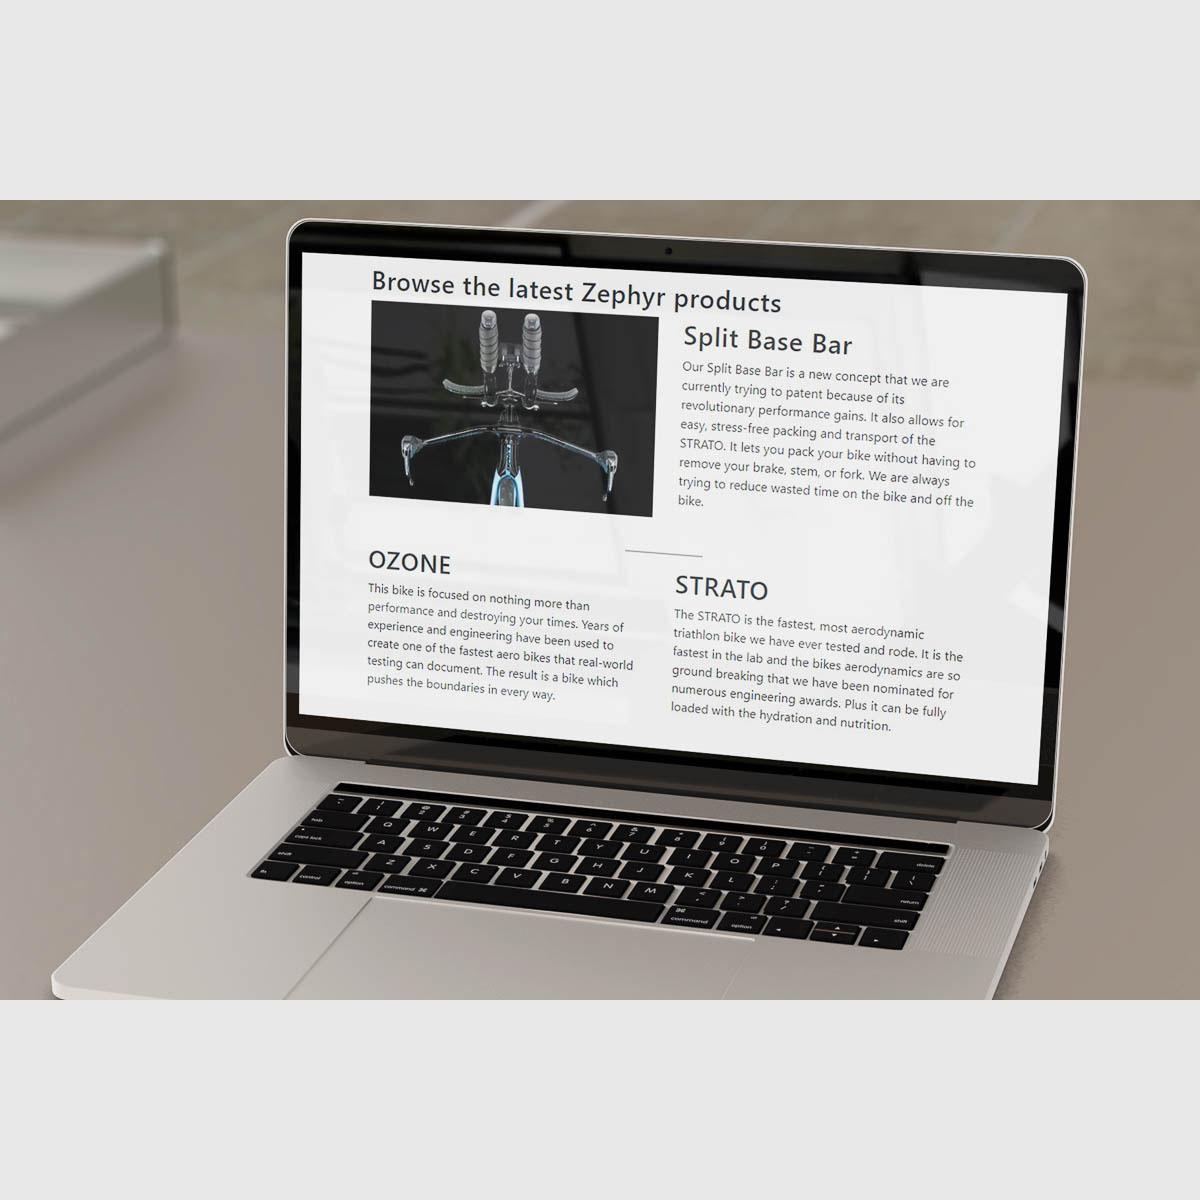 Wordpress website displayed on laptop